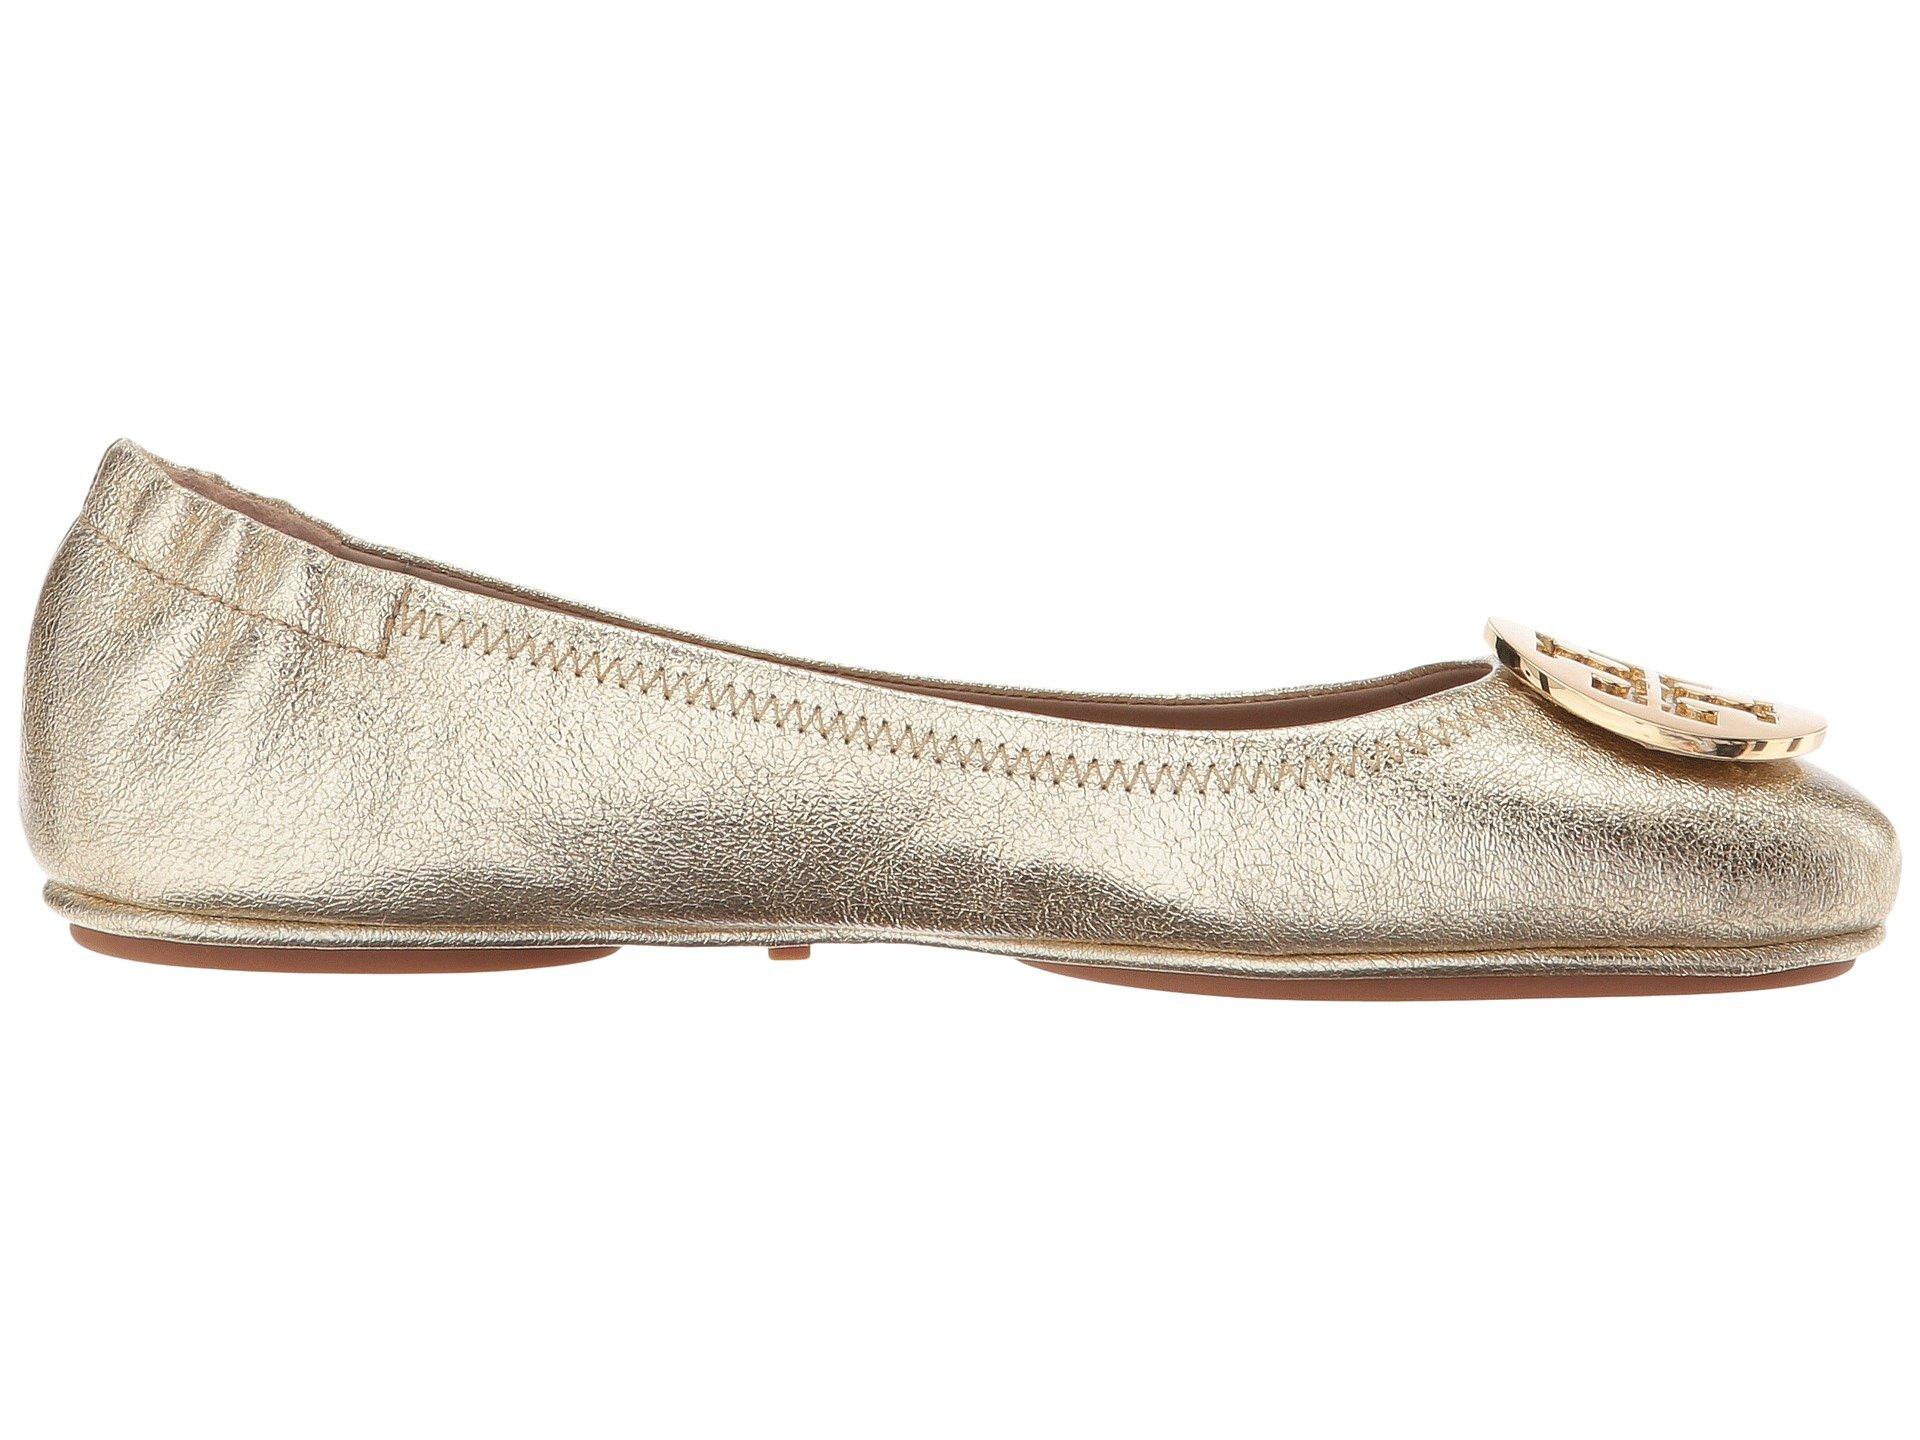 Tory Burch Minnie Travel Ballet At Zappos Com